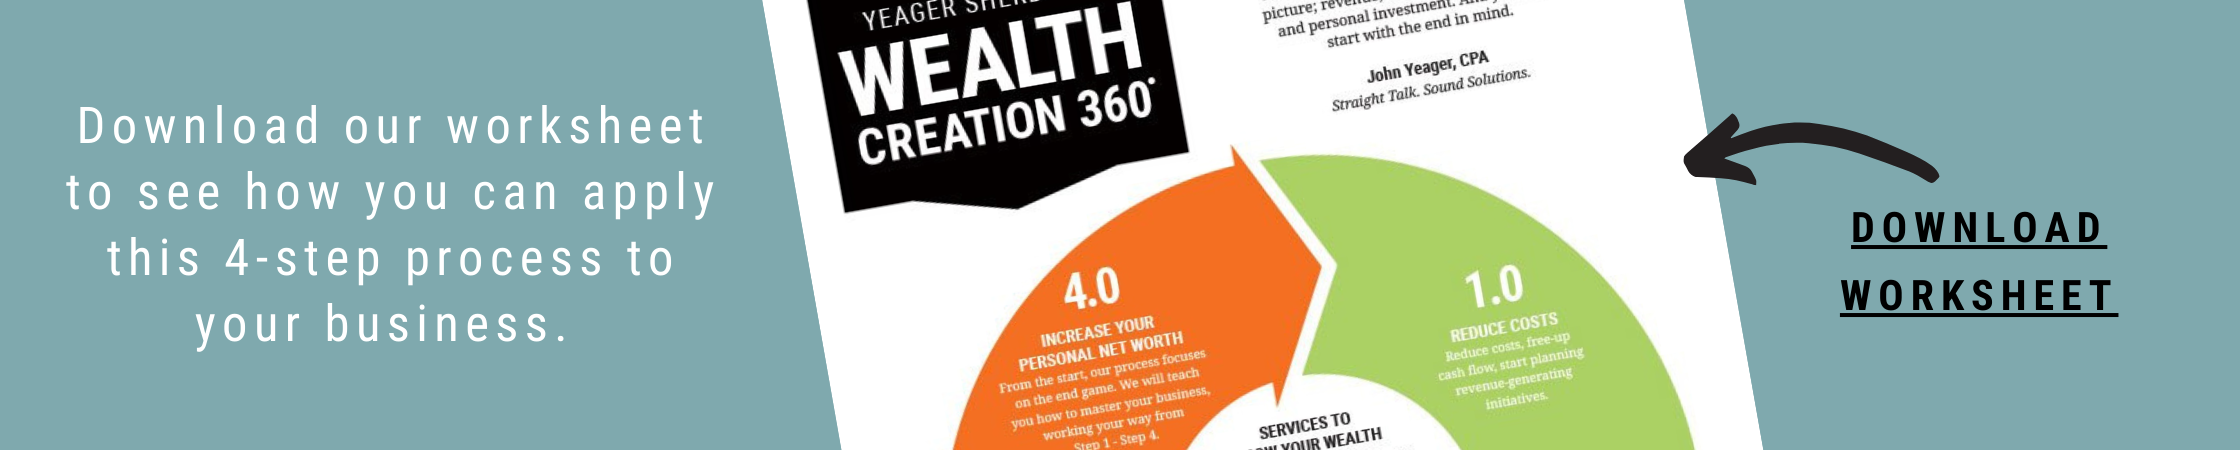 wealth creation 360 worksheet download